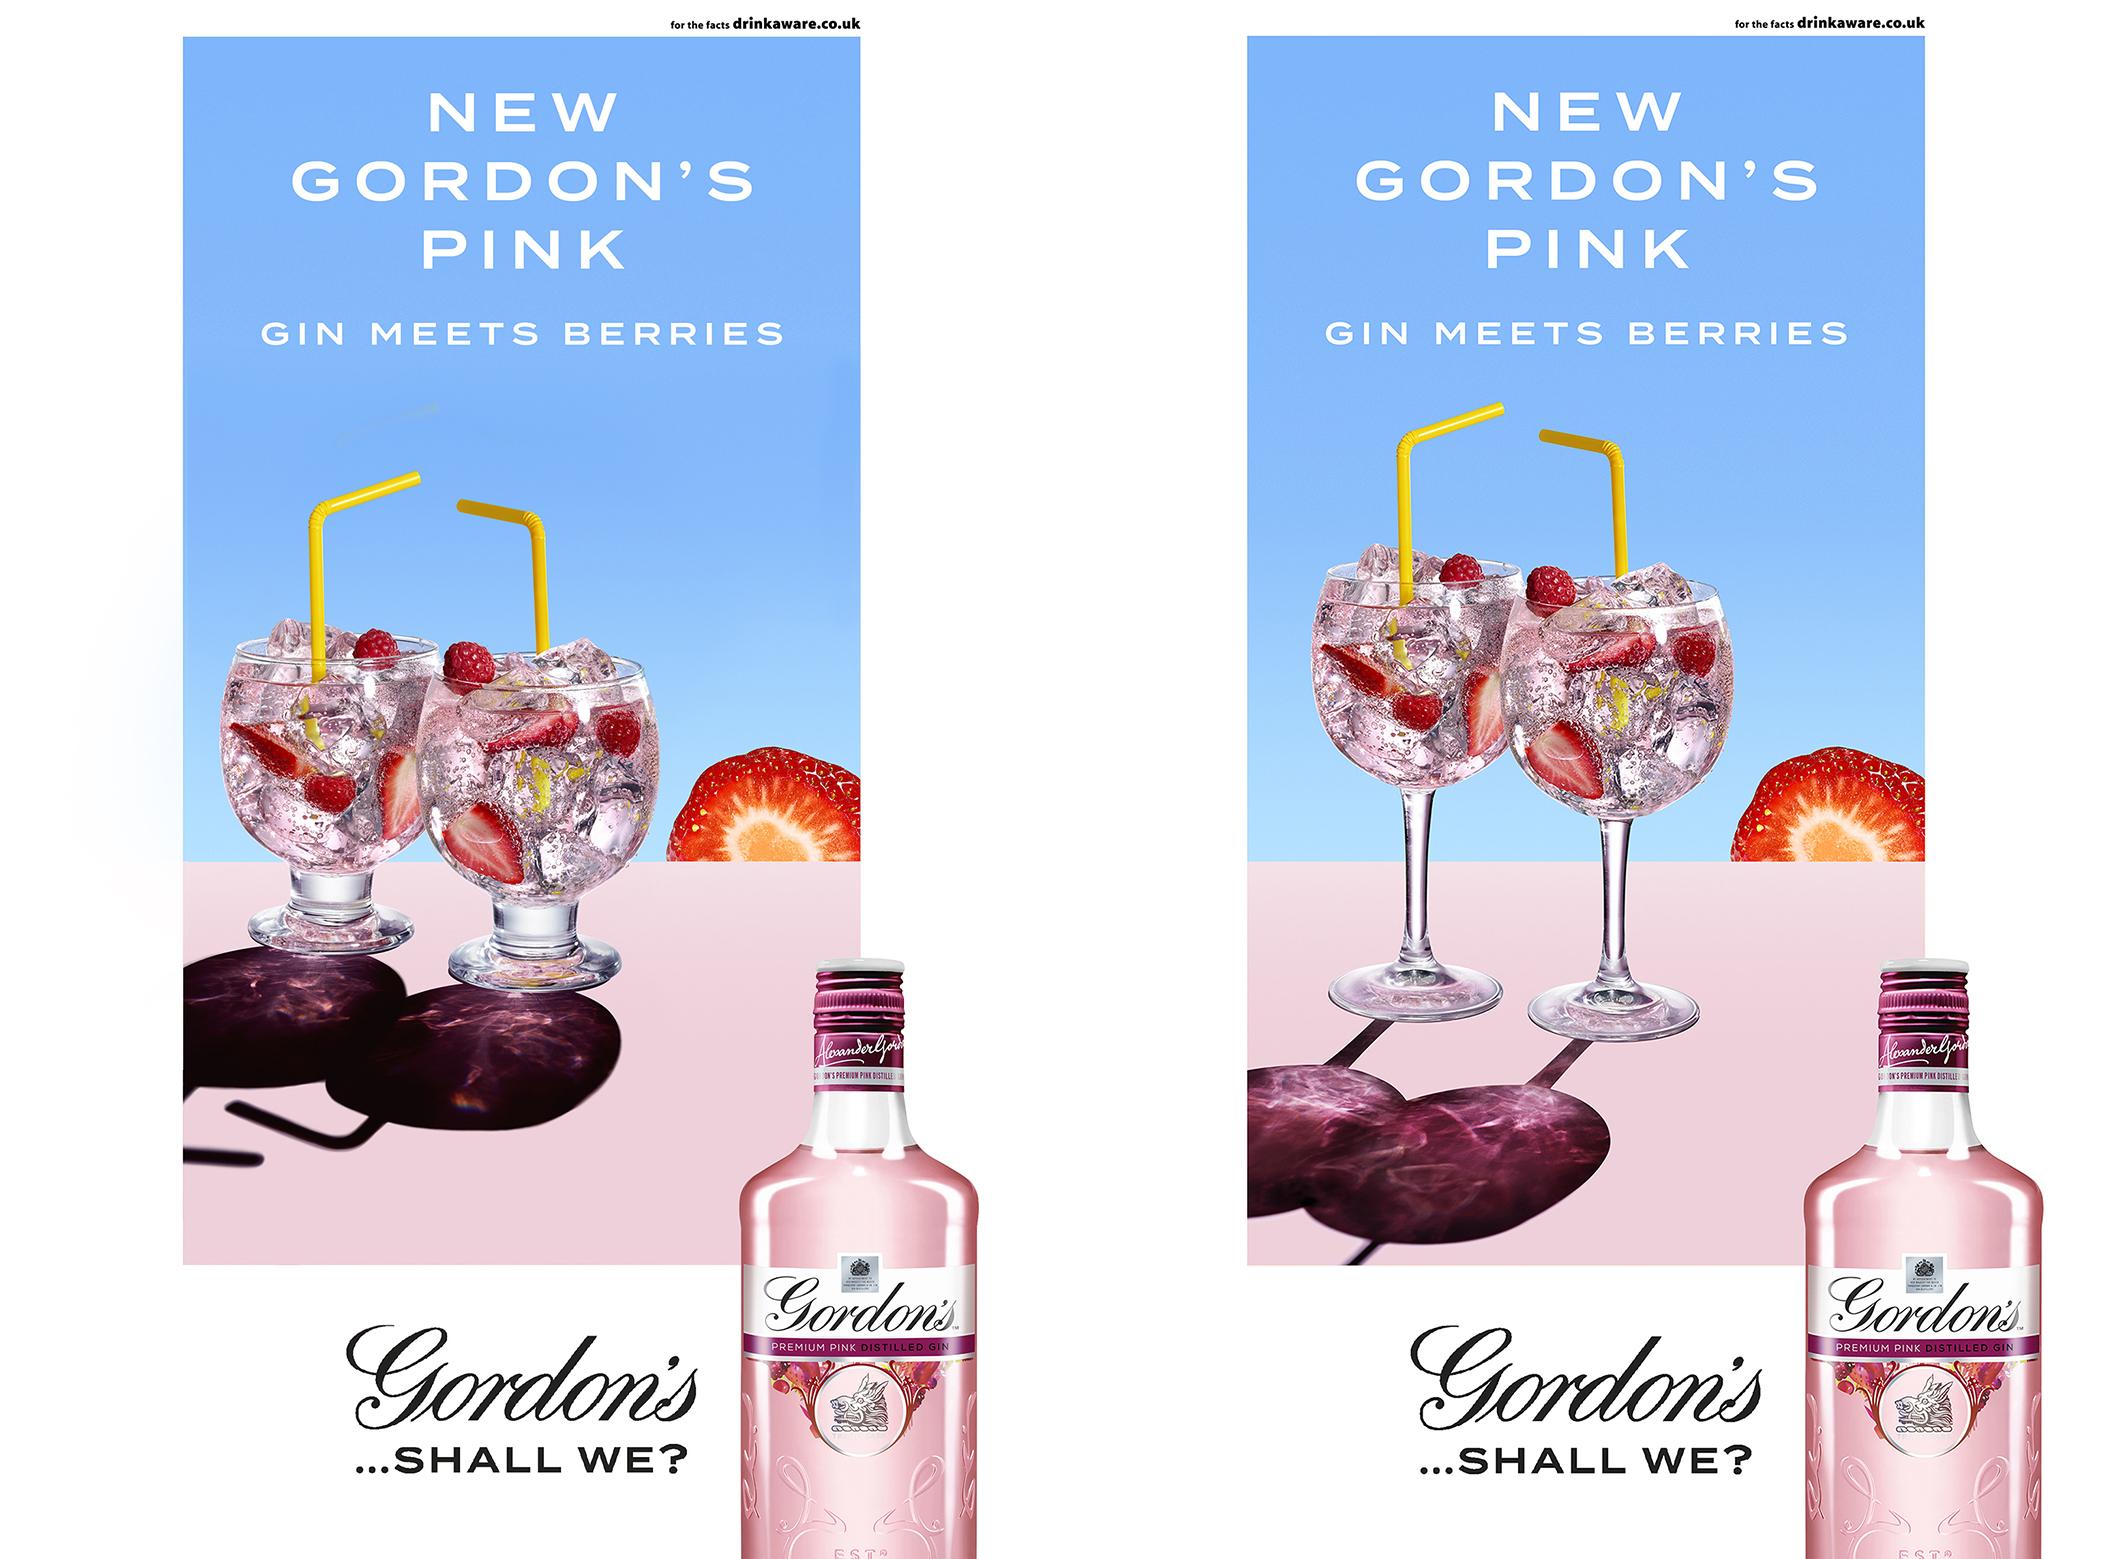 Pink_Gin_GB_6Sheetvvv